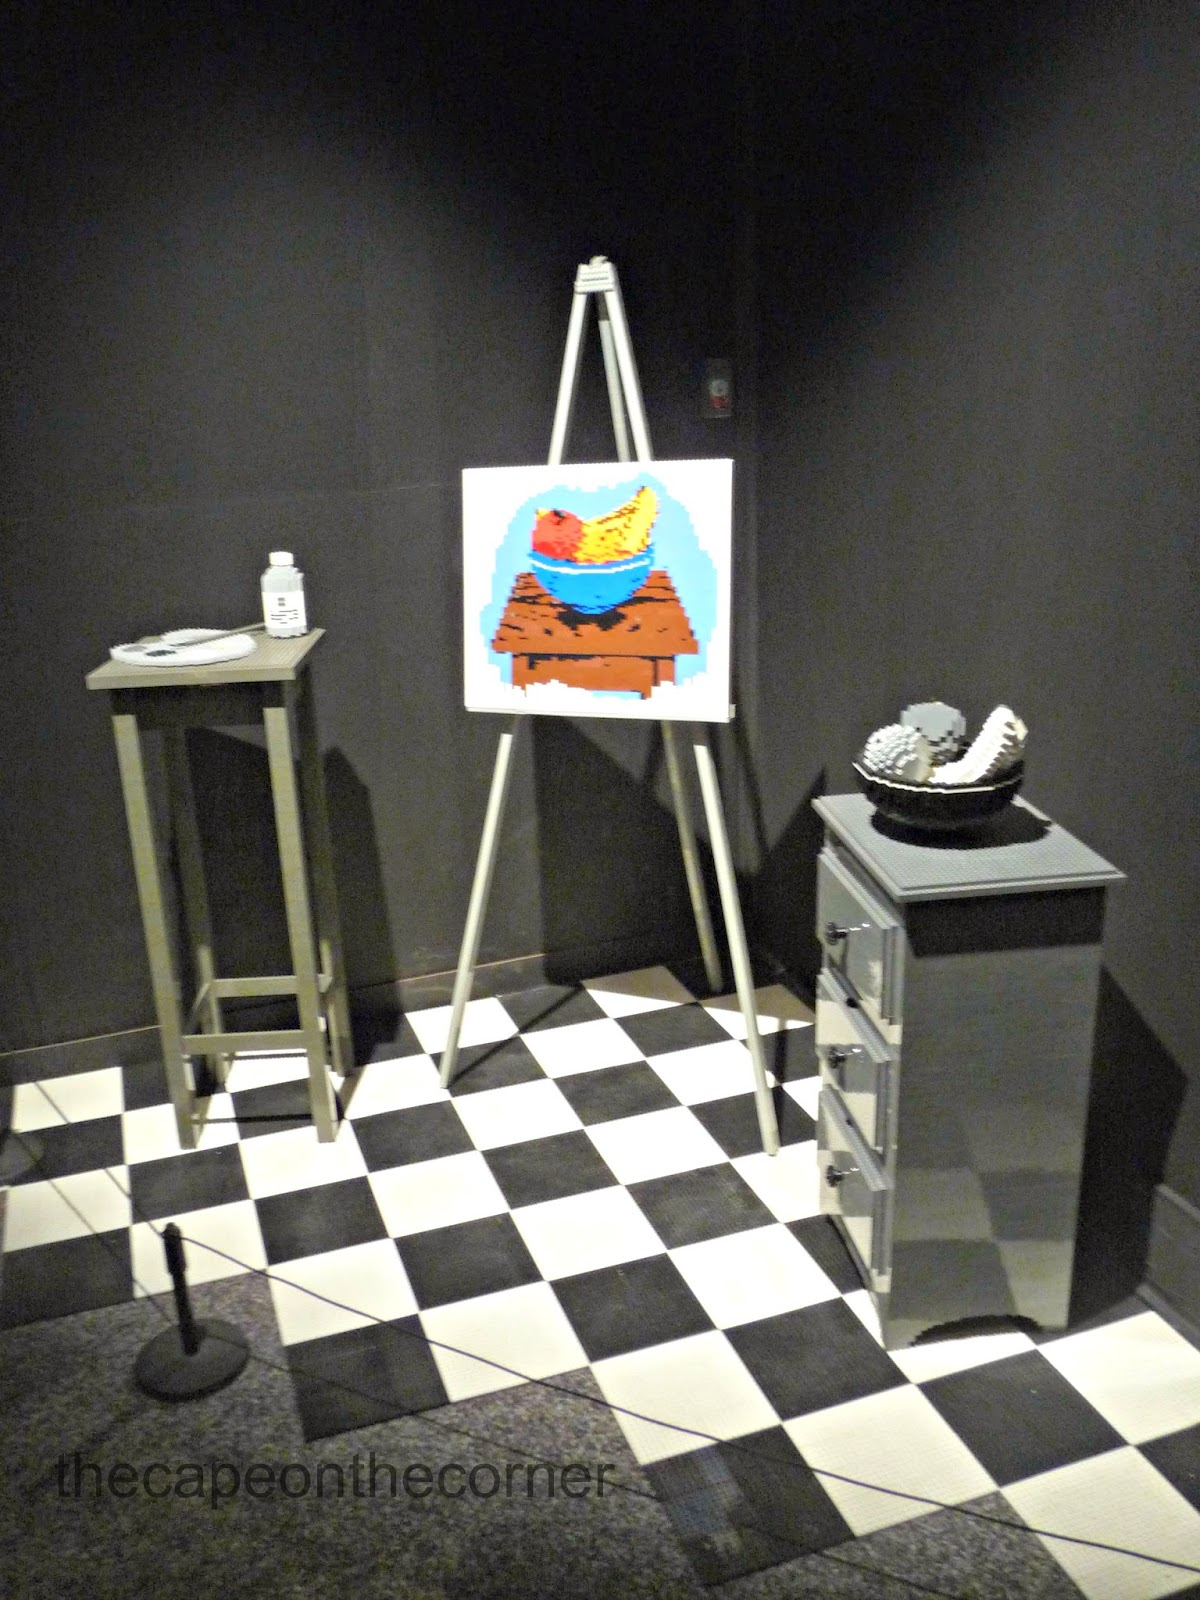 www.thecapeonthecorner.blogspot.com